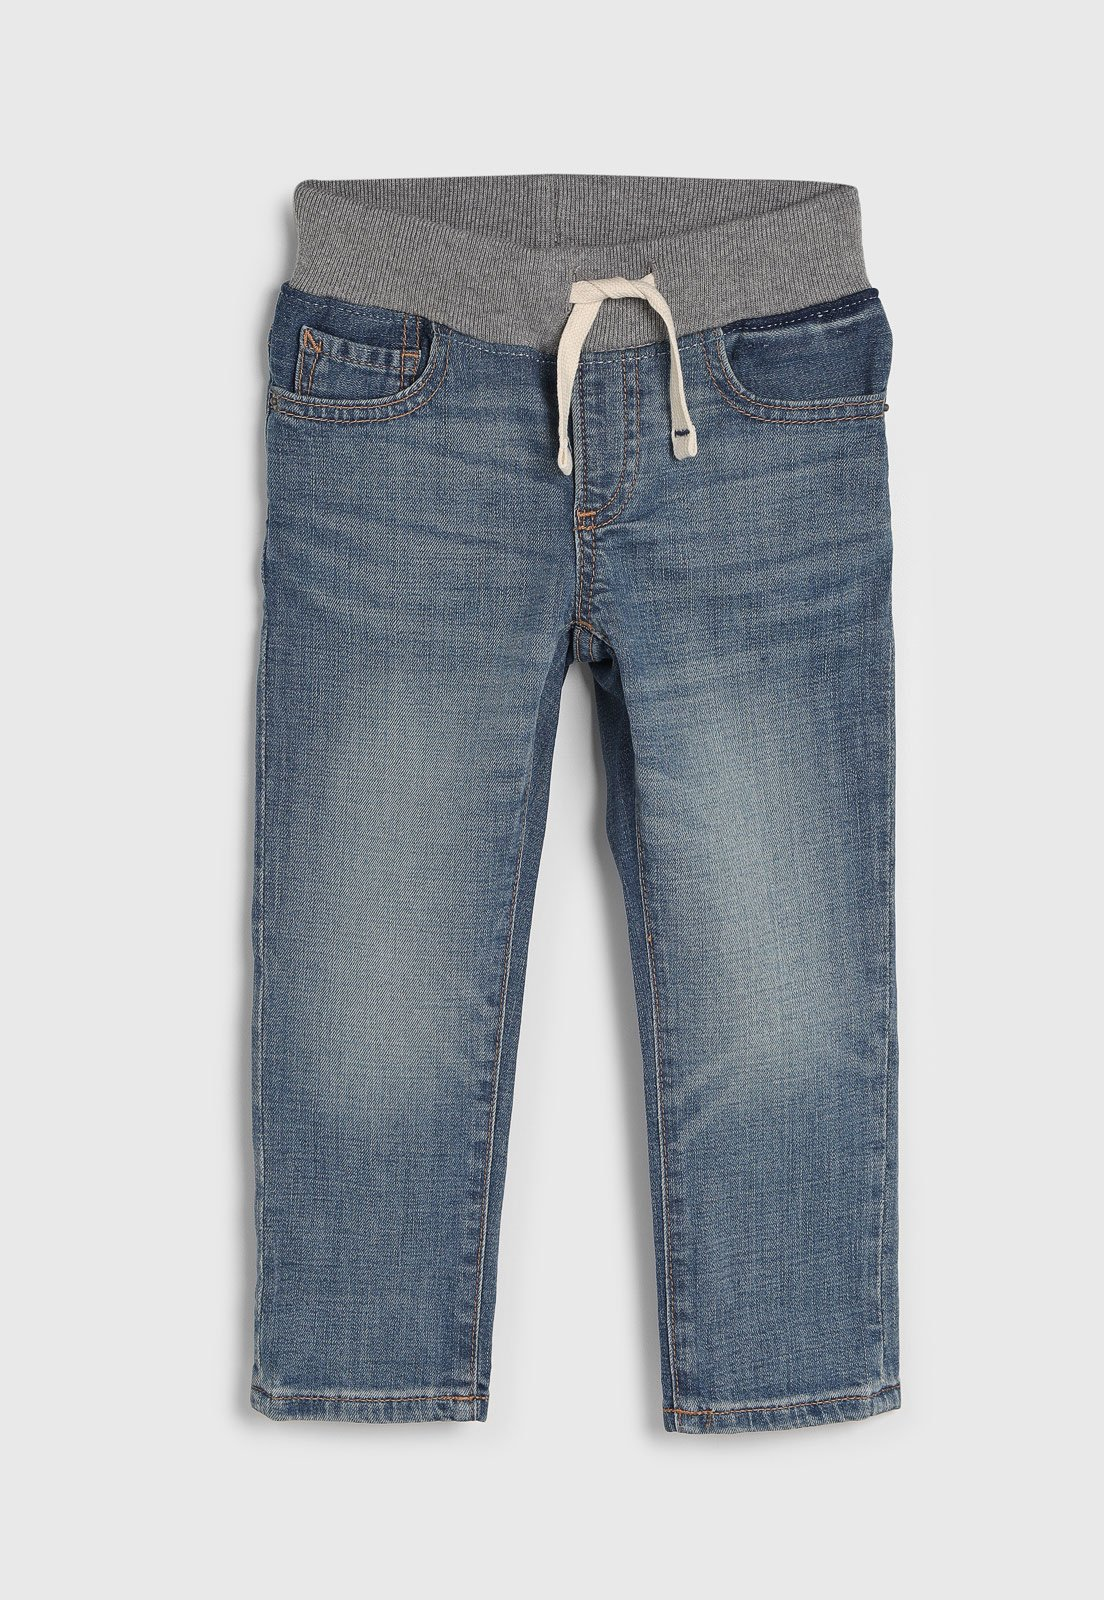 Calca Jeans Gap Infantil Jogger Estonada Azul Compre Agora Tricae Brasil